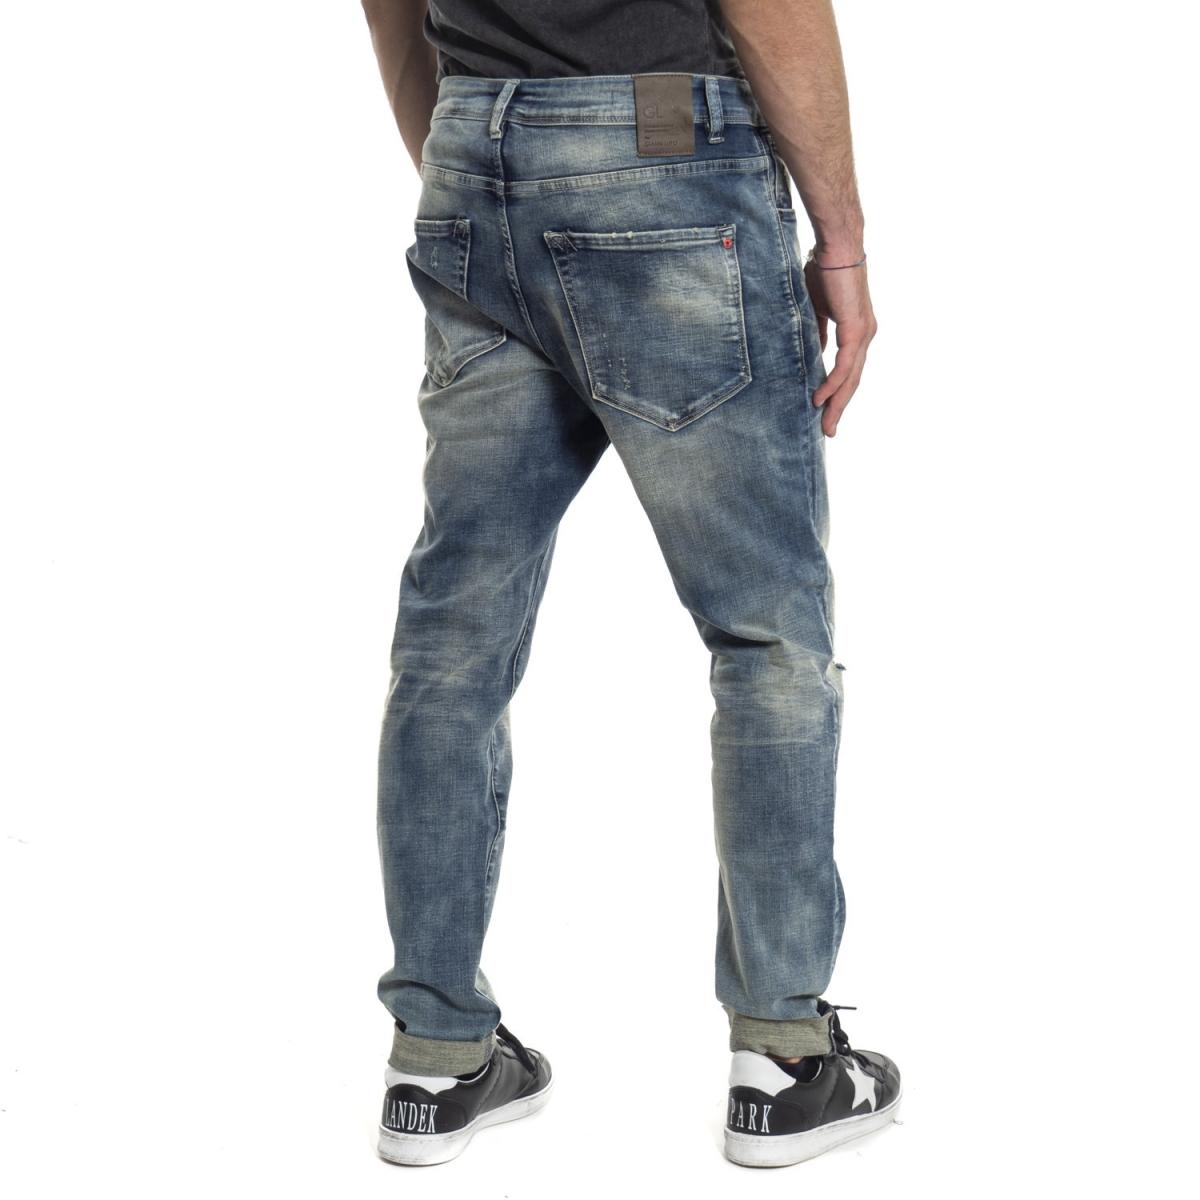 clothing Denim men Jeans GL078F GIANNI LUPO Cafedelmar Shop